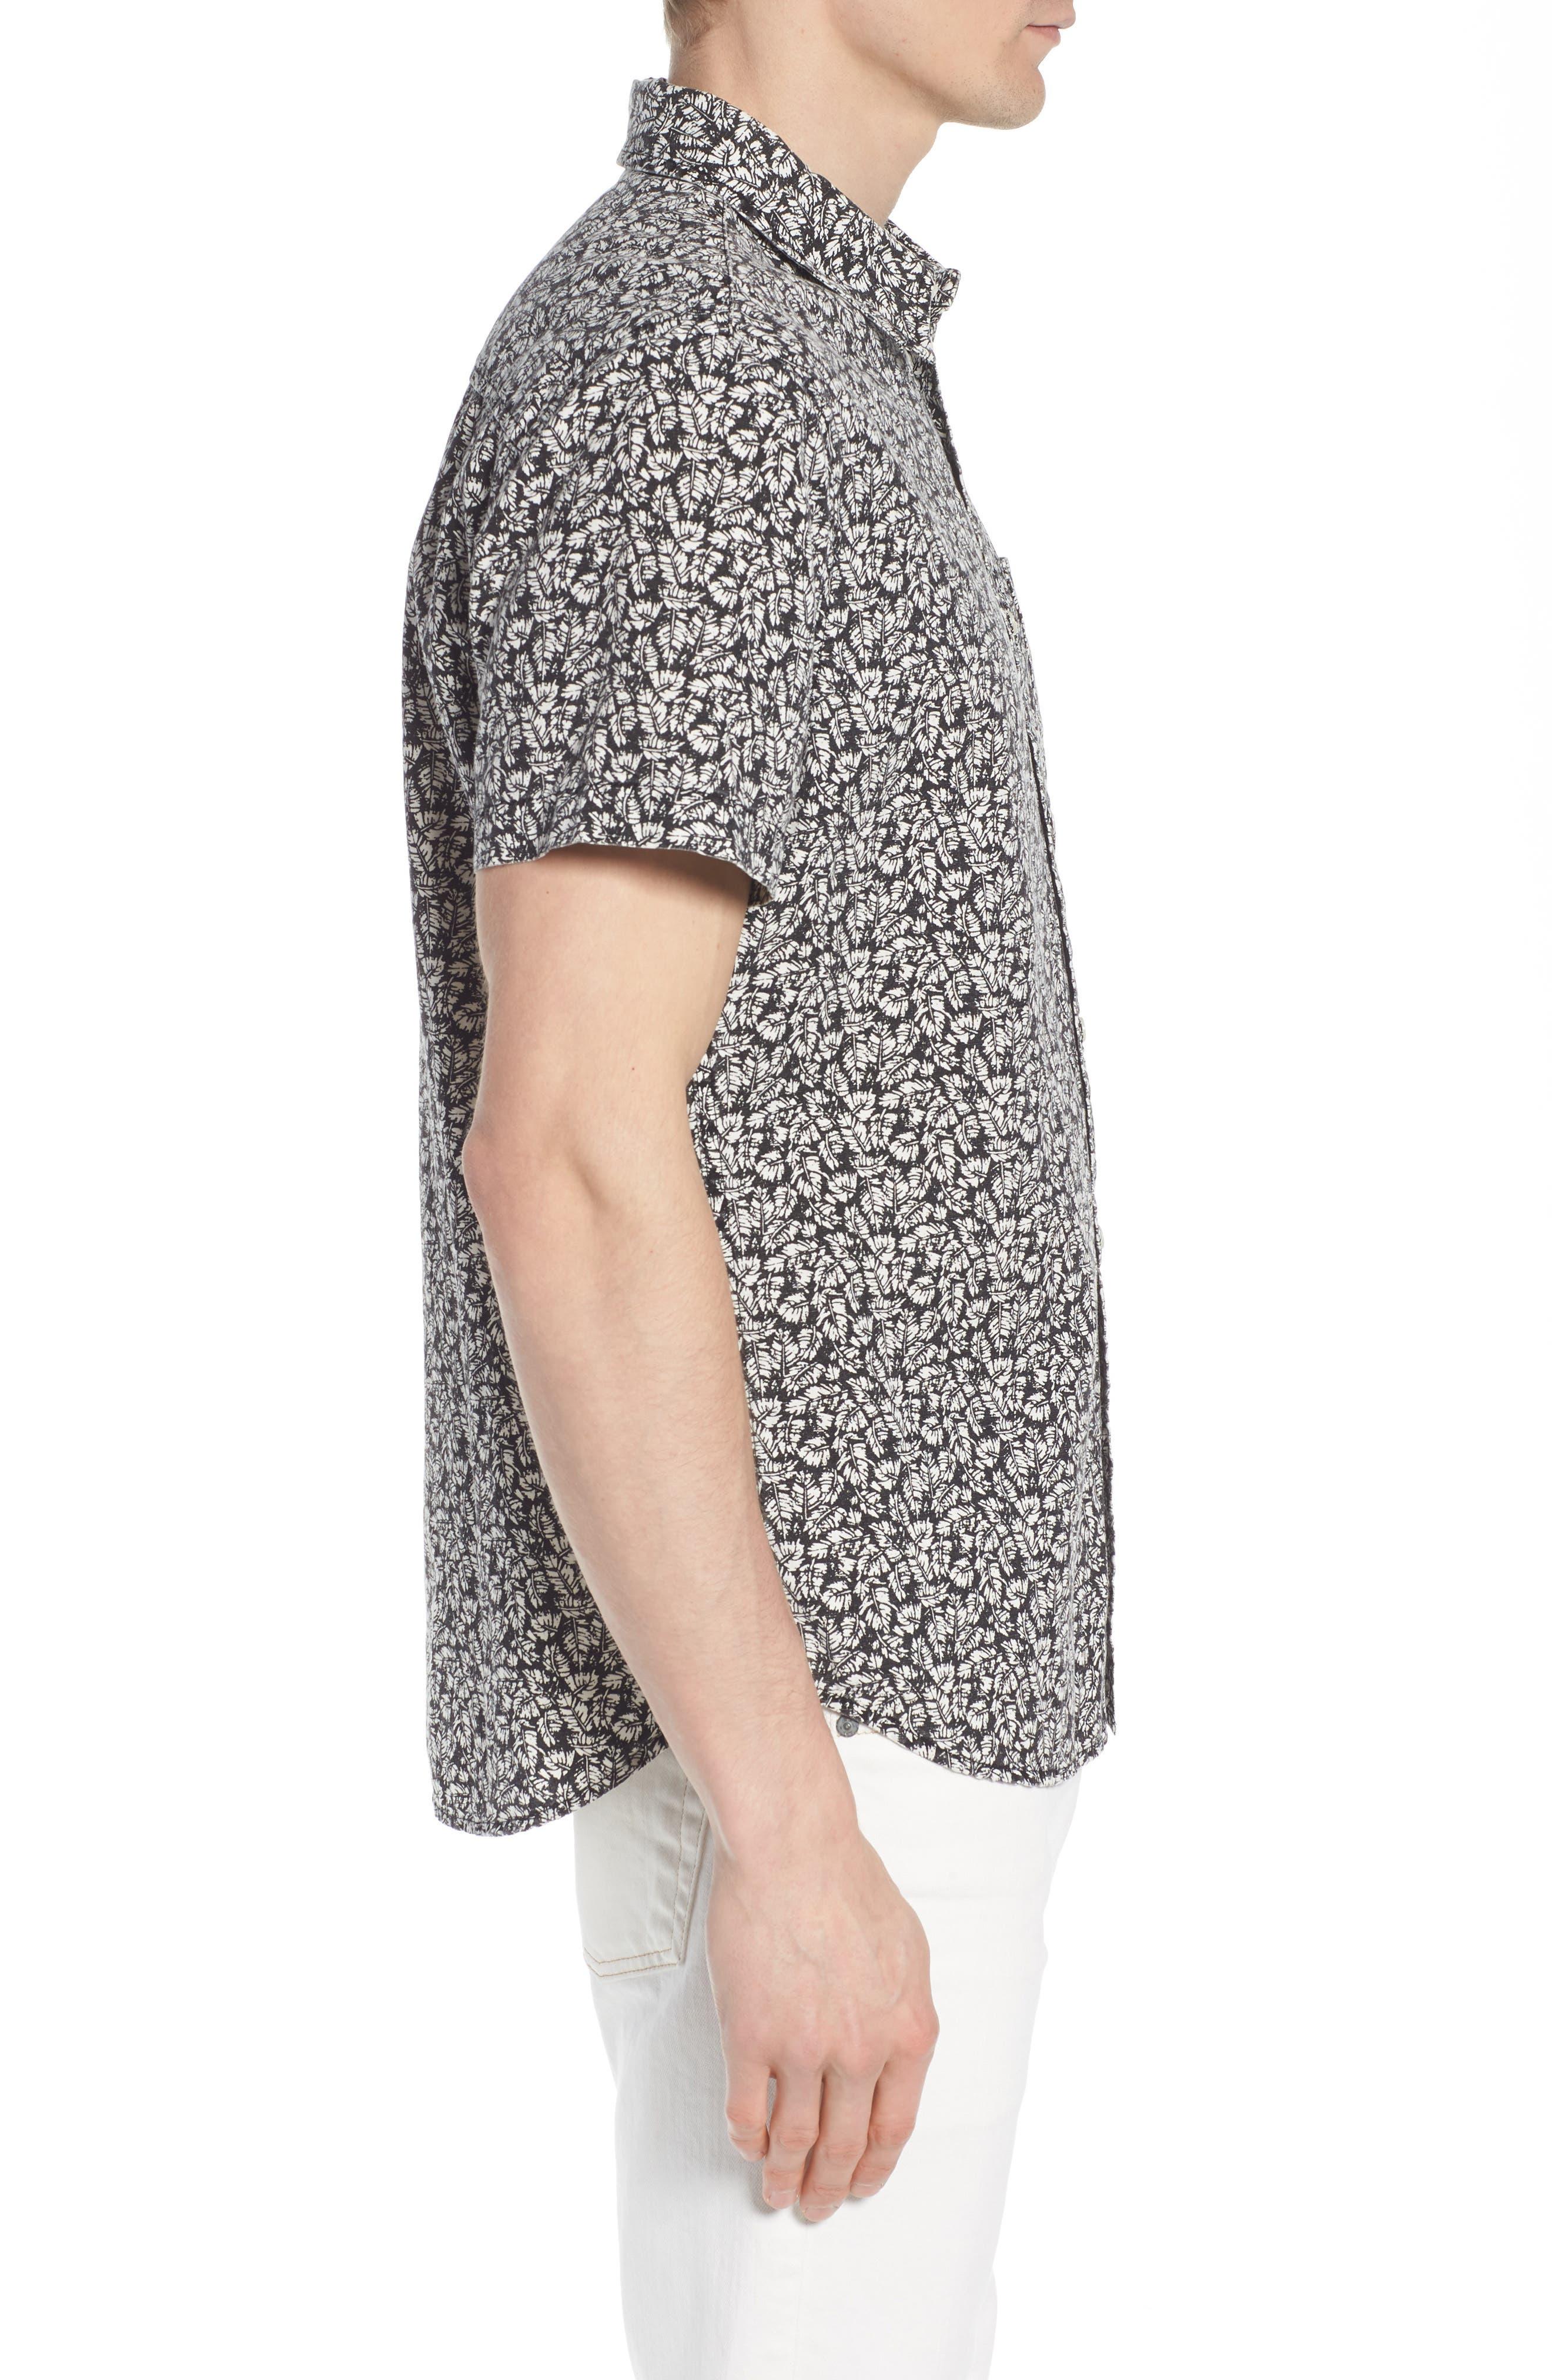 Nash Regular Fit Short Sleeve Sport Shirt,                             Alternate thumbnail 4, color,                             Palm Leaf True Black/ White